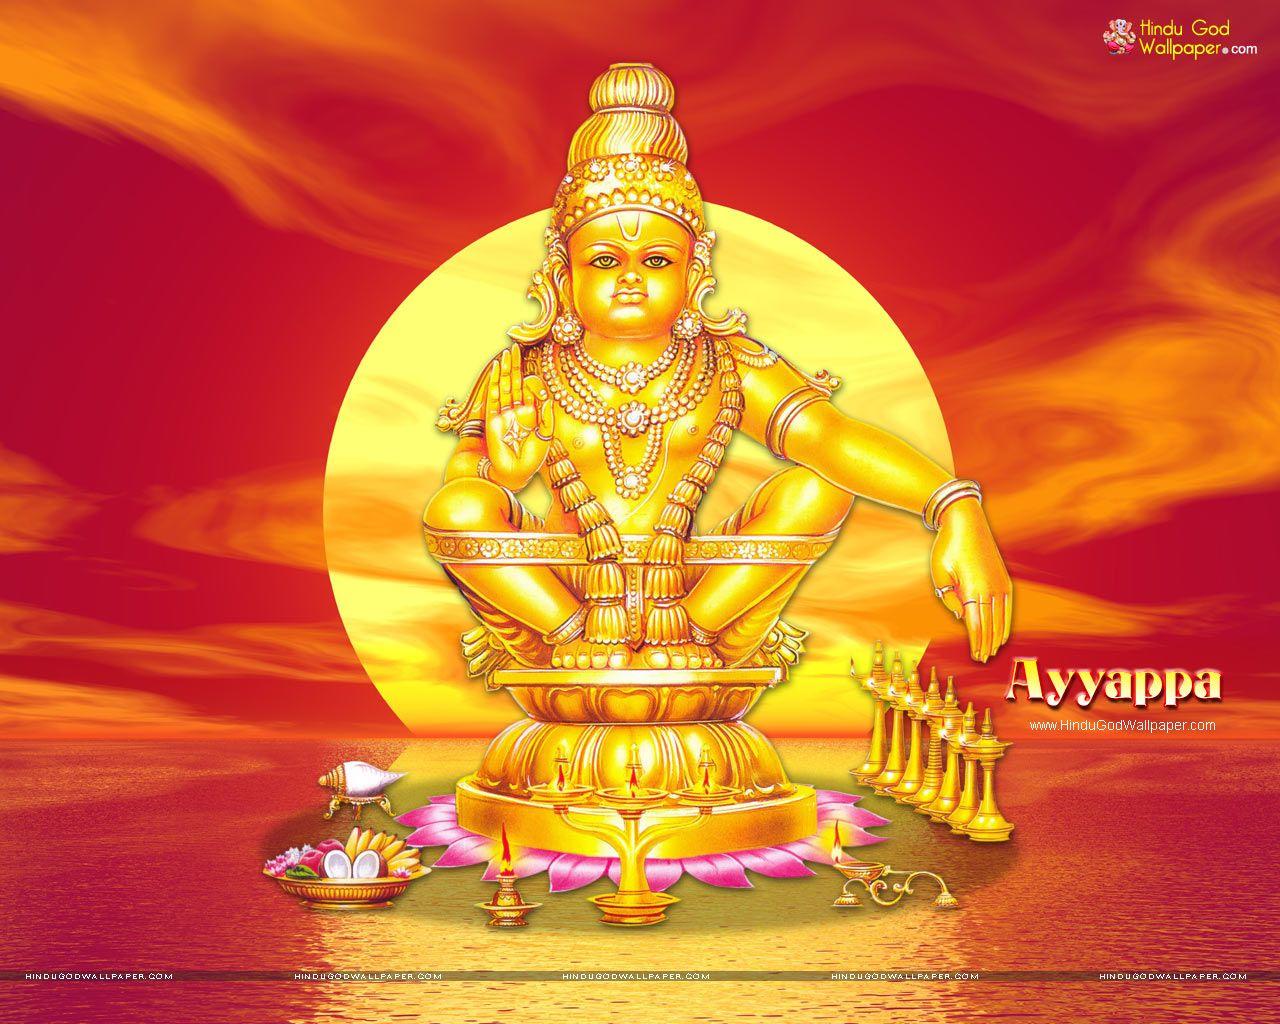 Lord Ayyappa Hd Wallpapers Lord Ayyappa Wallpapers Pinterest